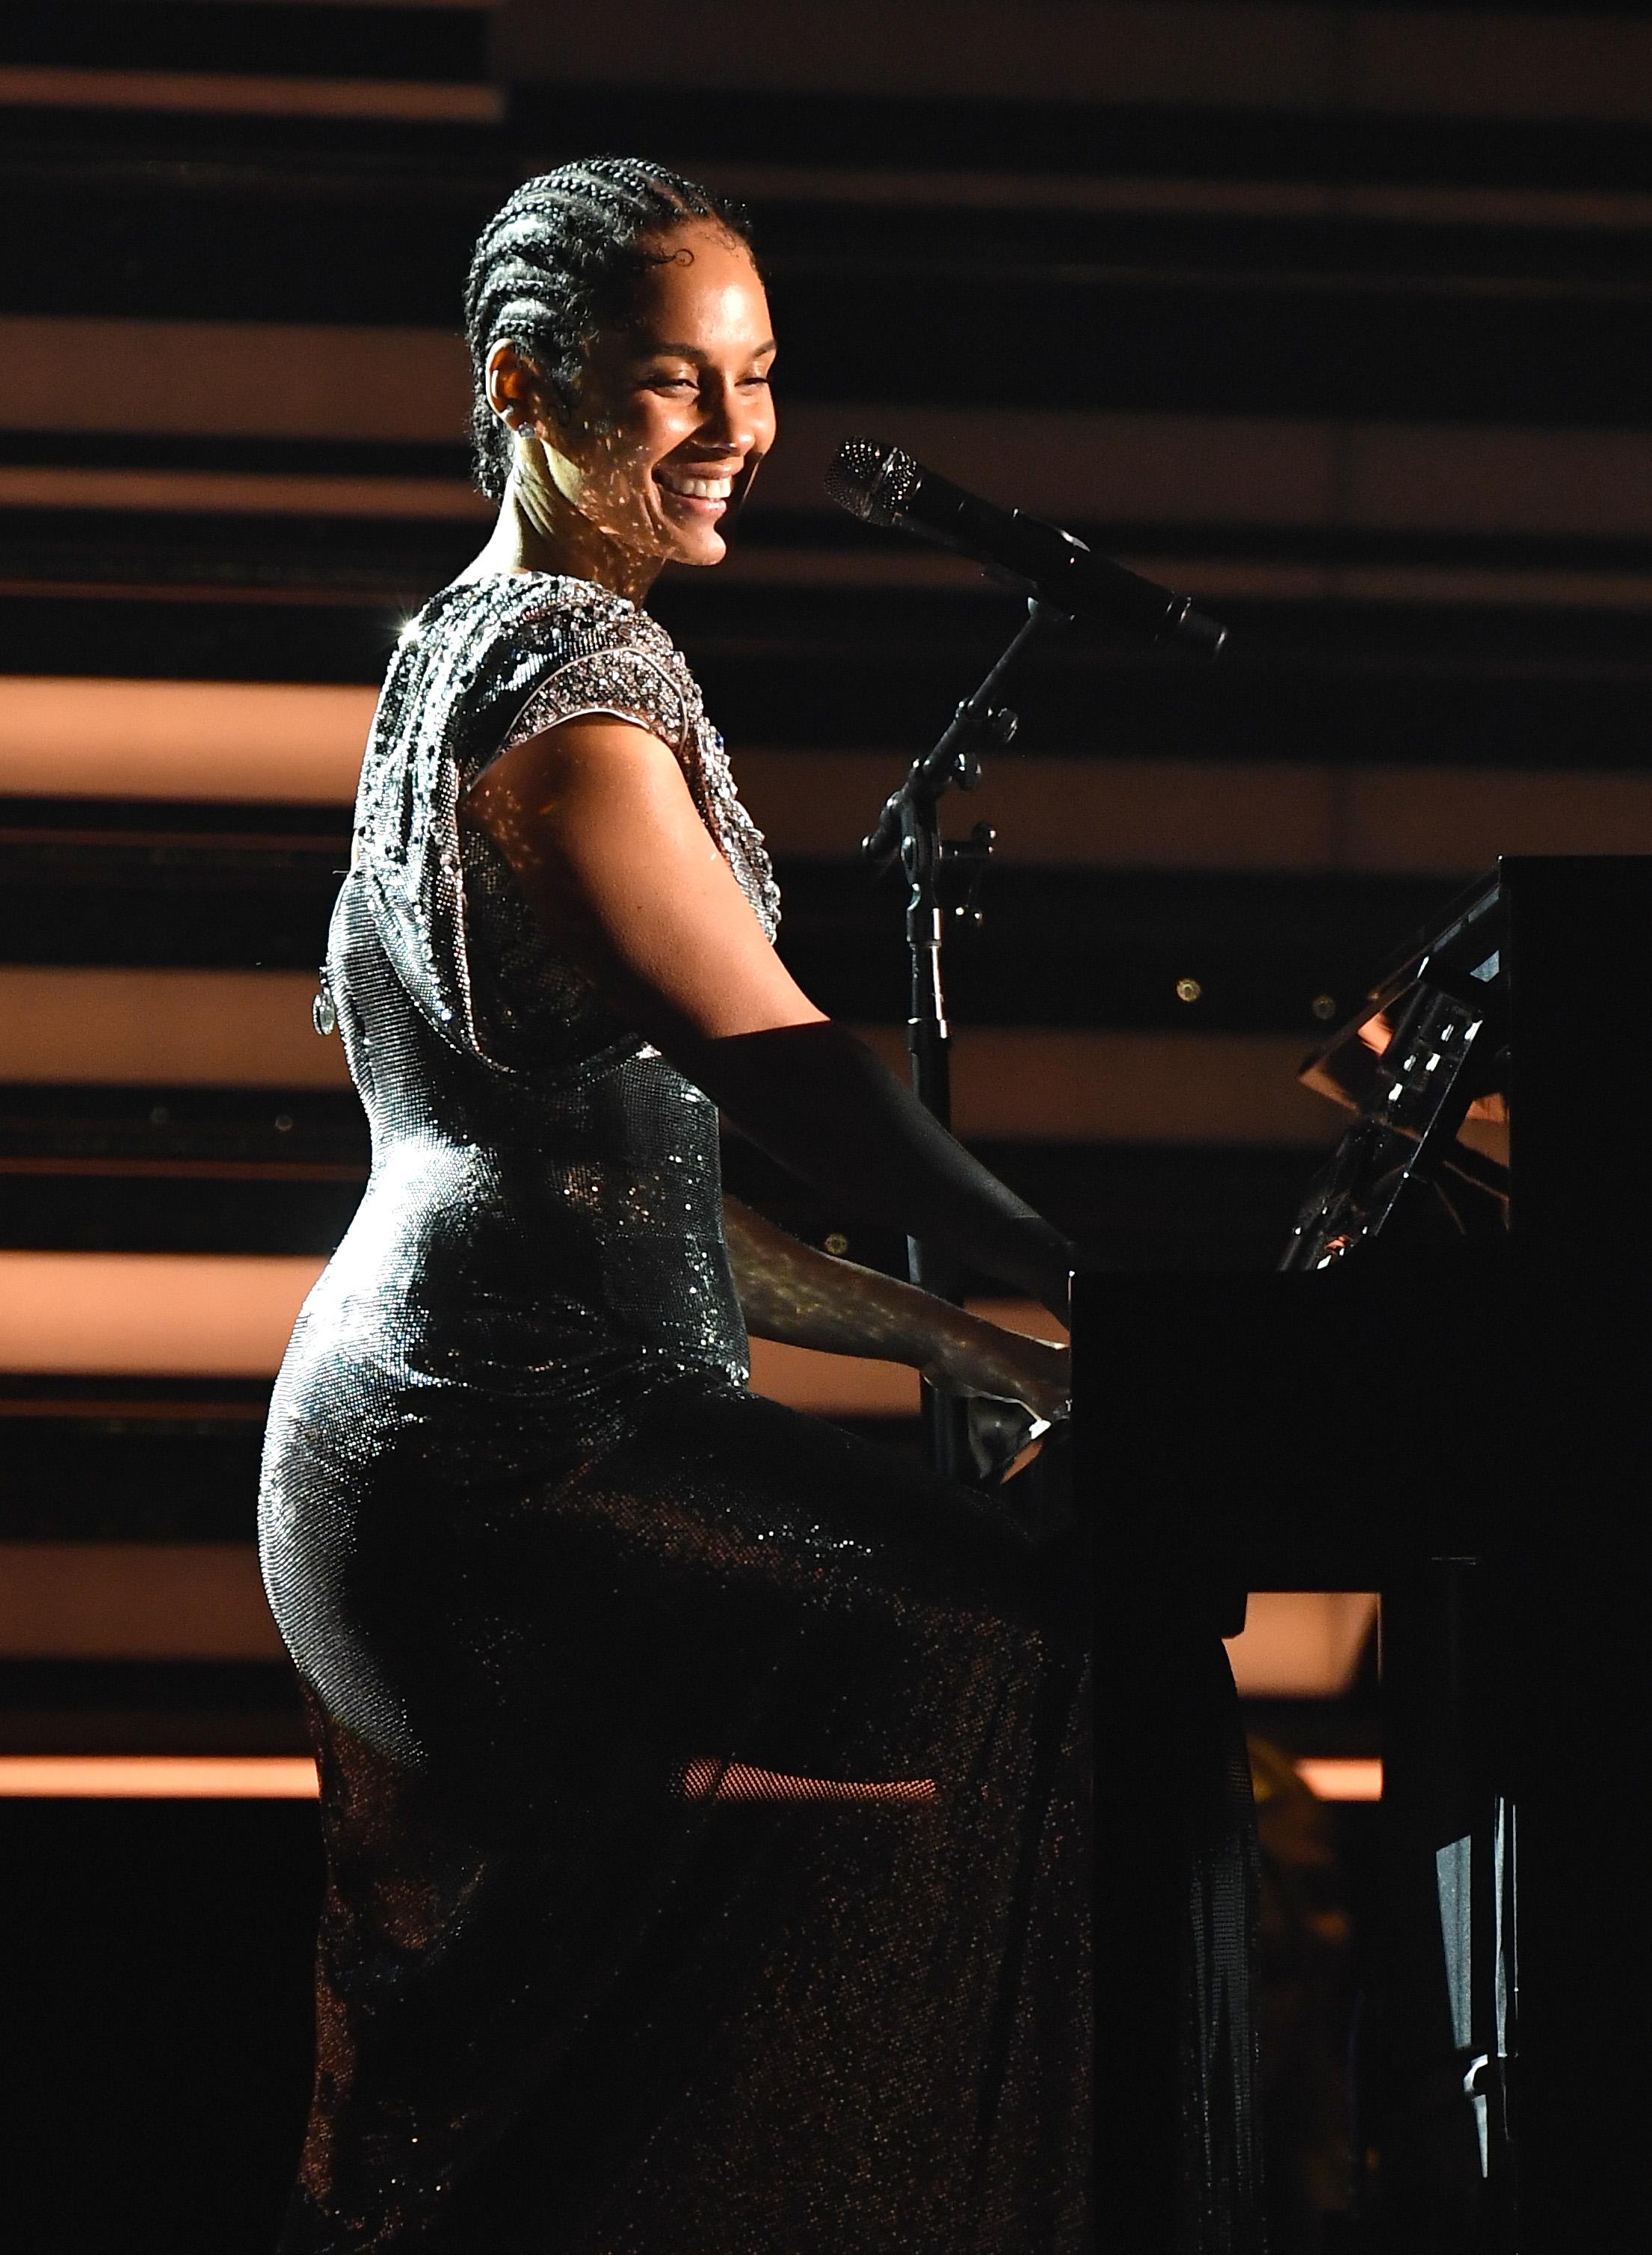 Alicia Keys Honors Kobe Bryant in Emotional Grammys 2020 Opener: 'We're All Feeling Sadness'